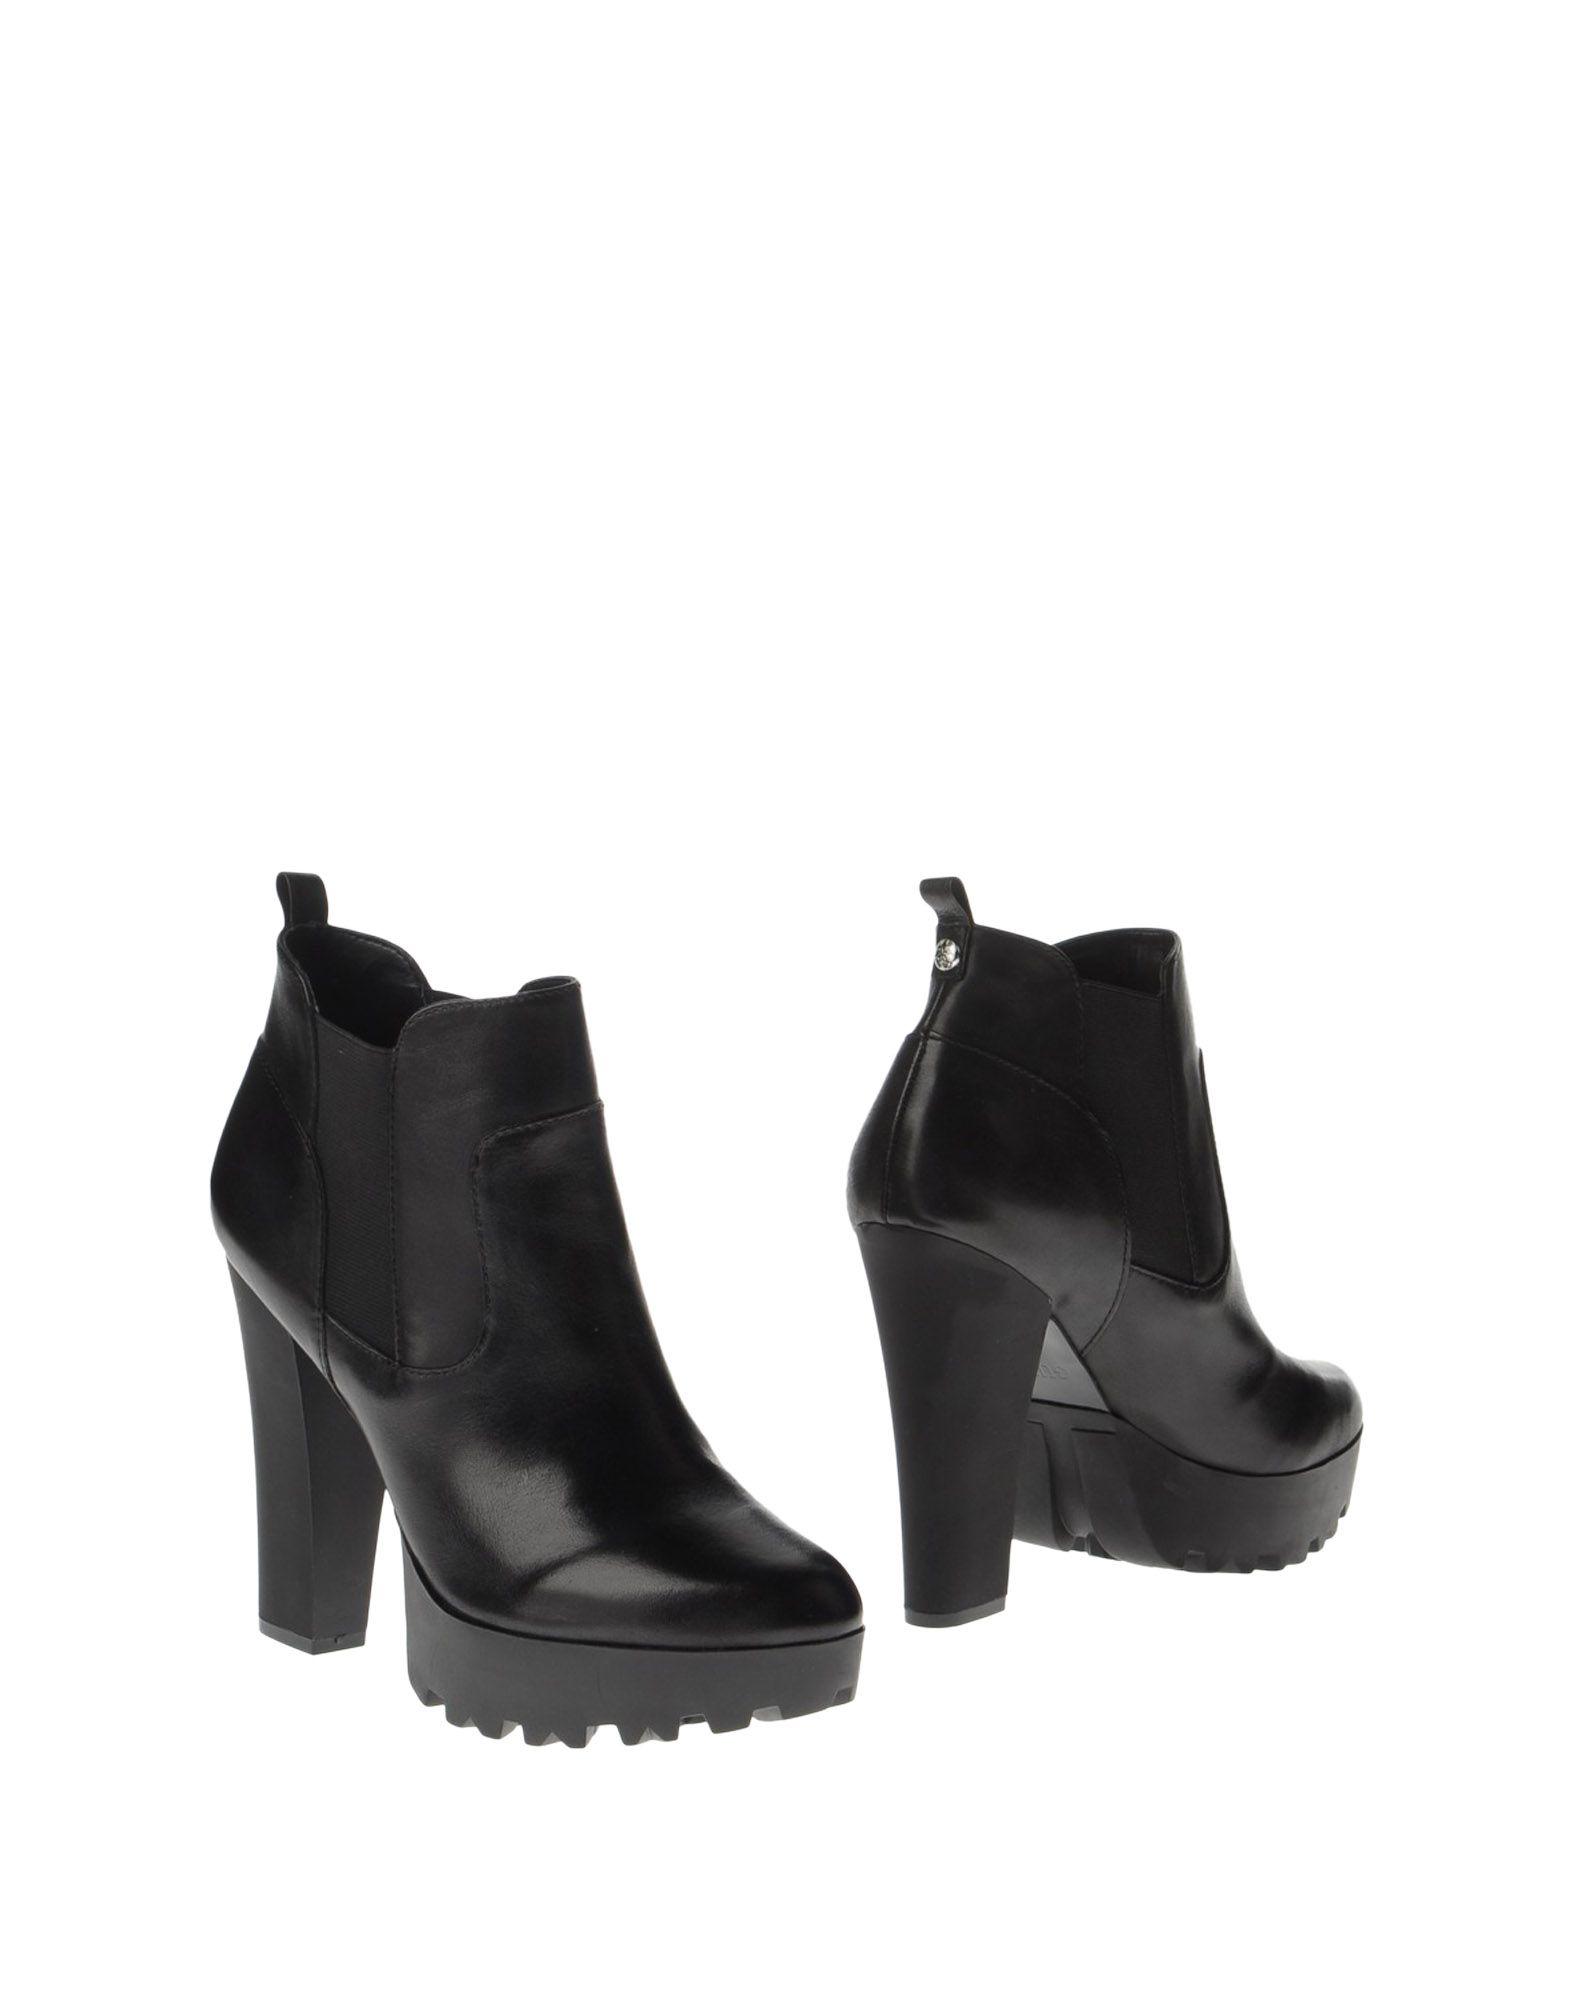 GUESS Полусапоги и высокие ботинки george j love полусапоги и высокие ботинки